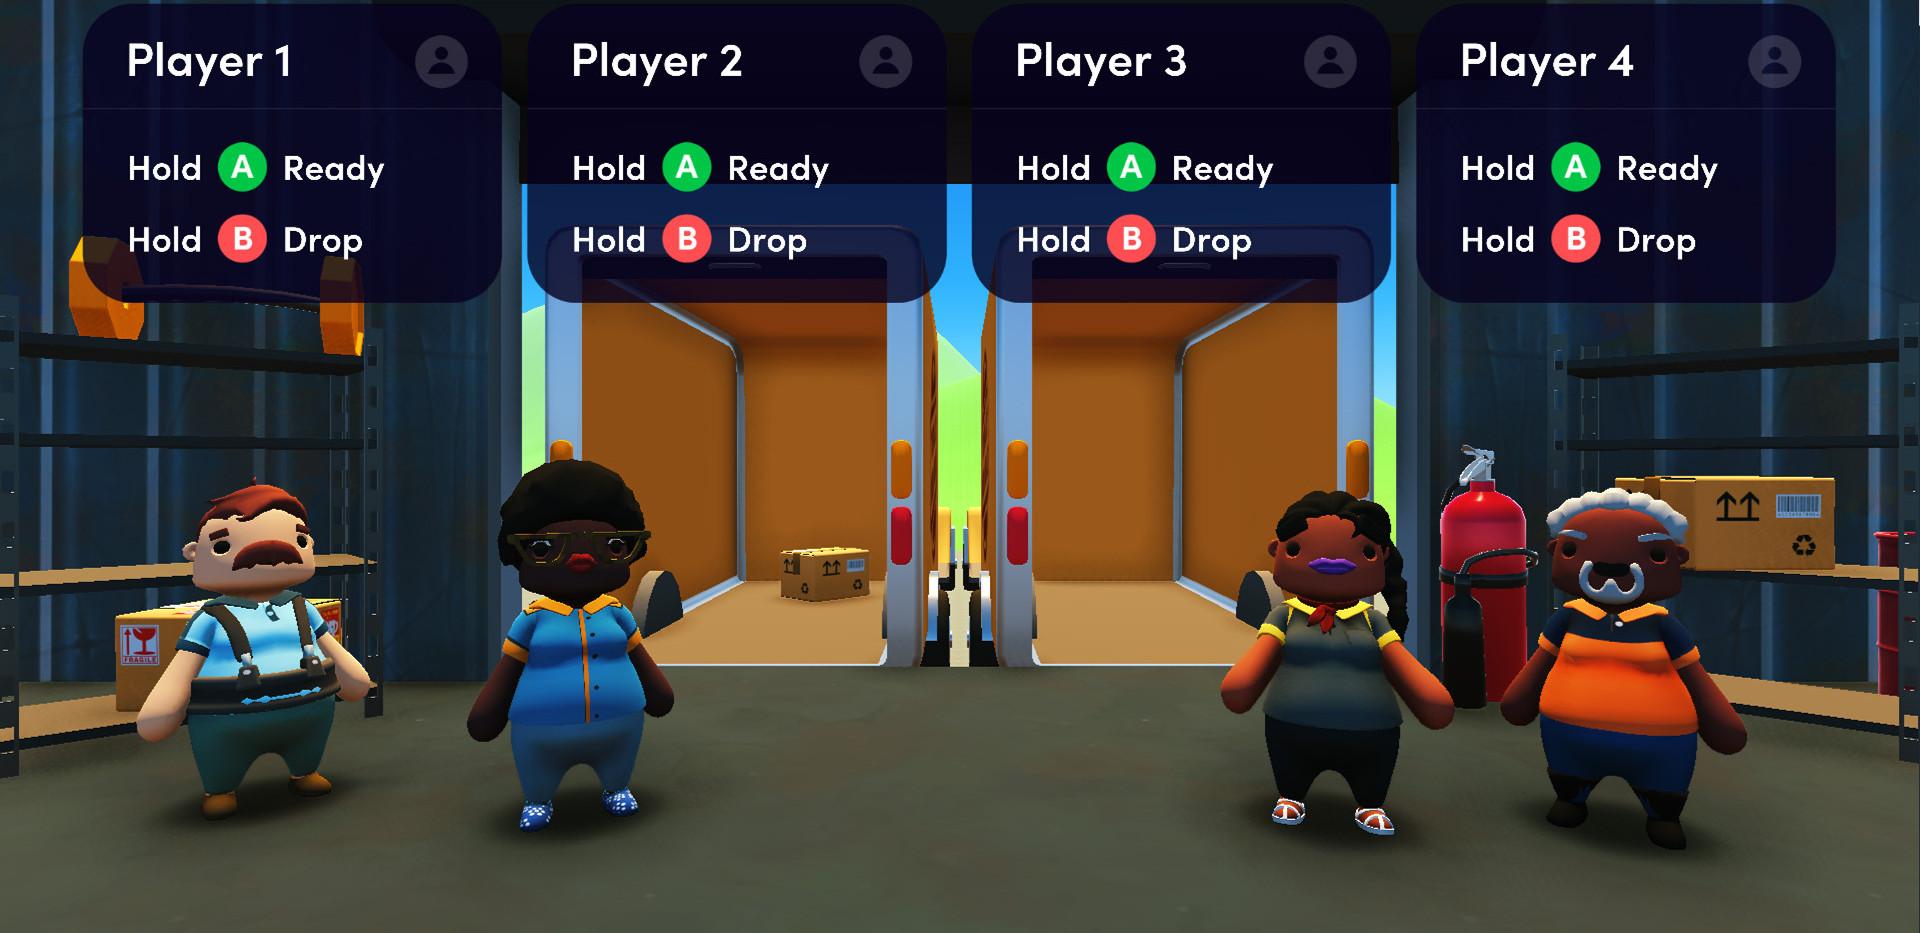 4player_5.jpg